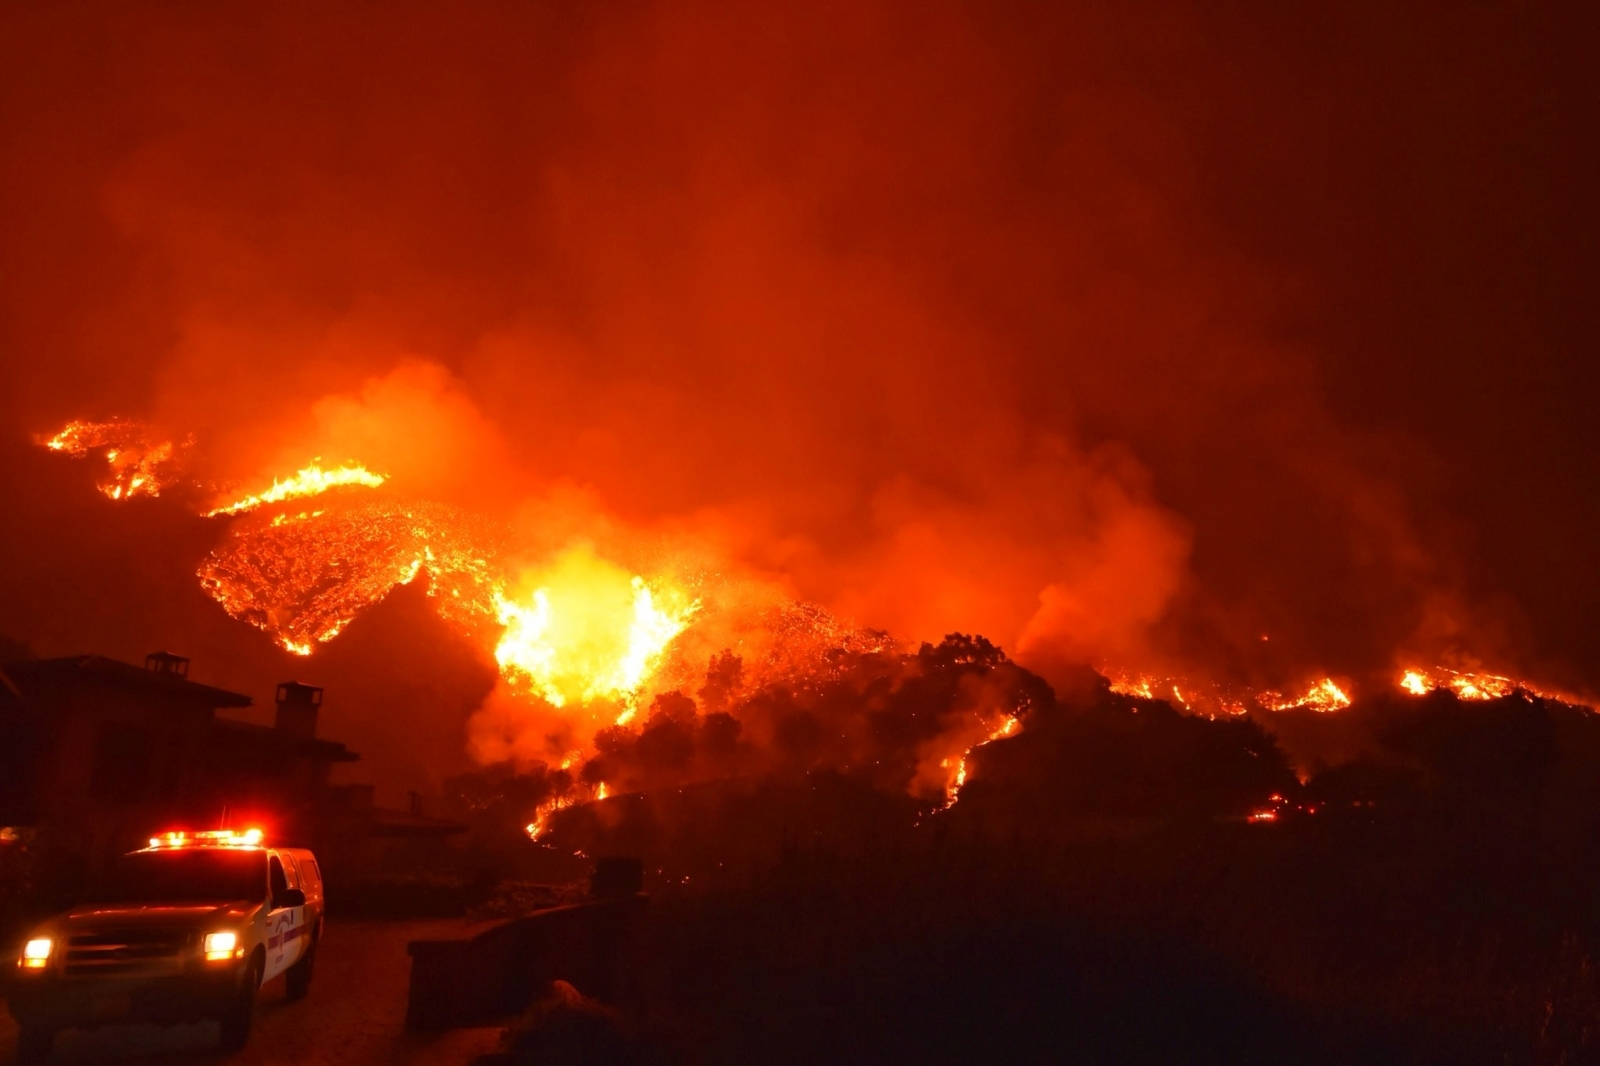 Thomas Fire California firefighter killed